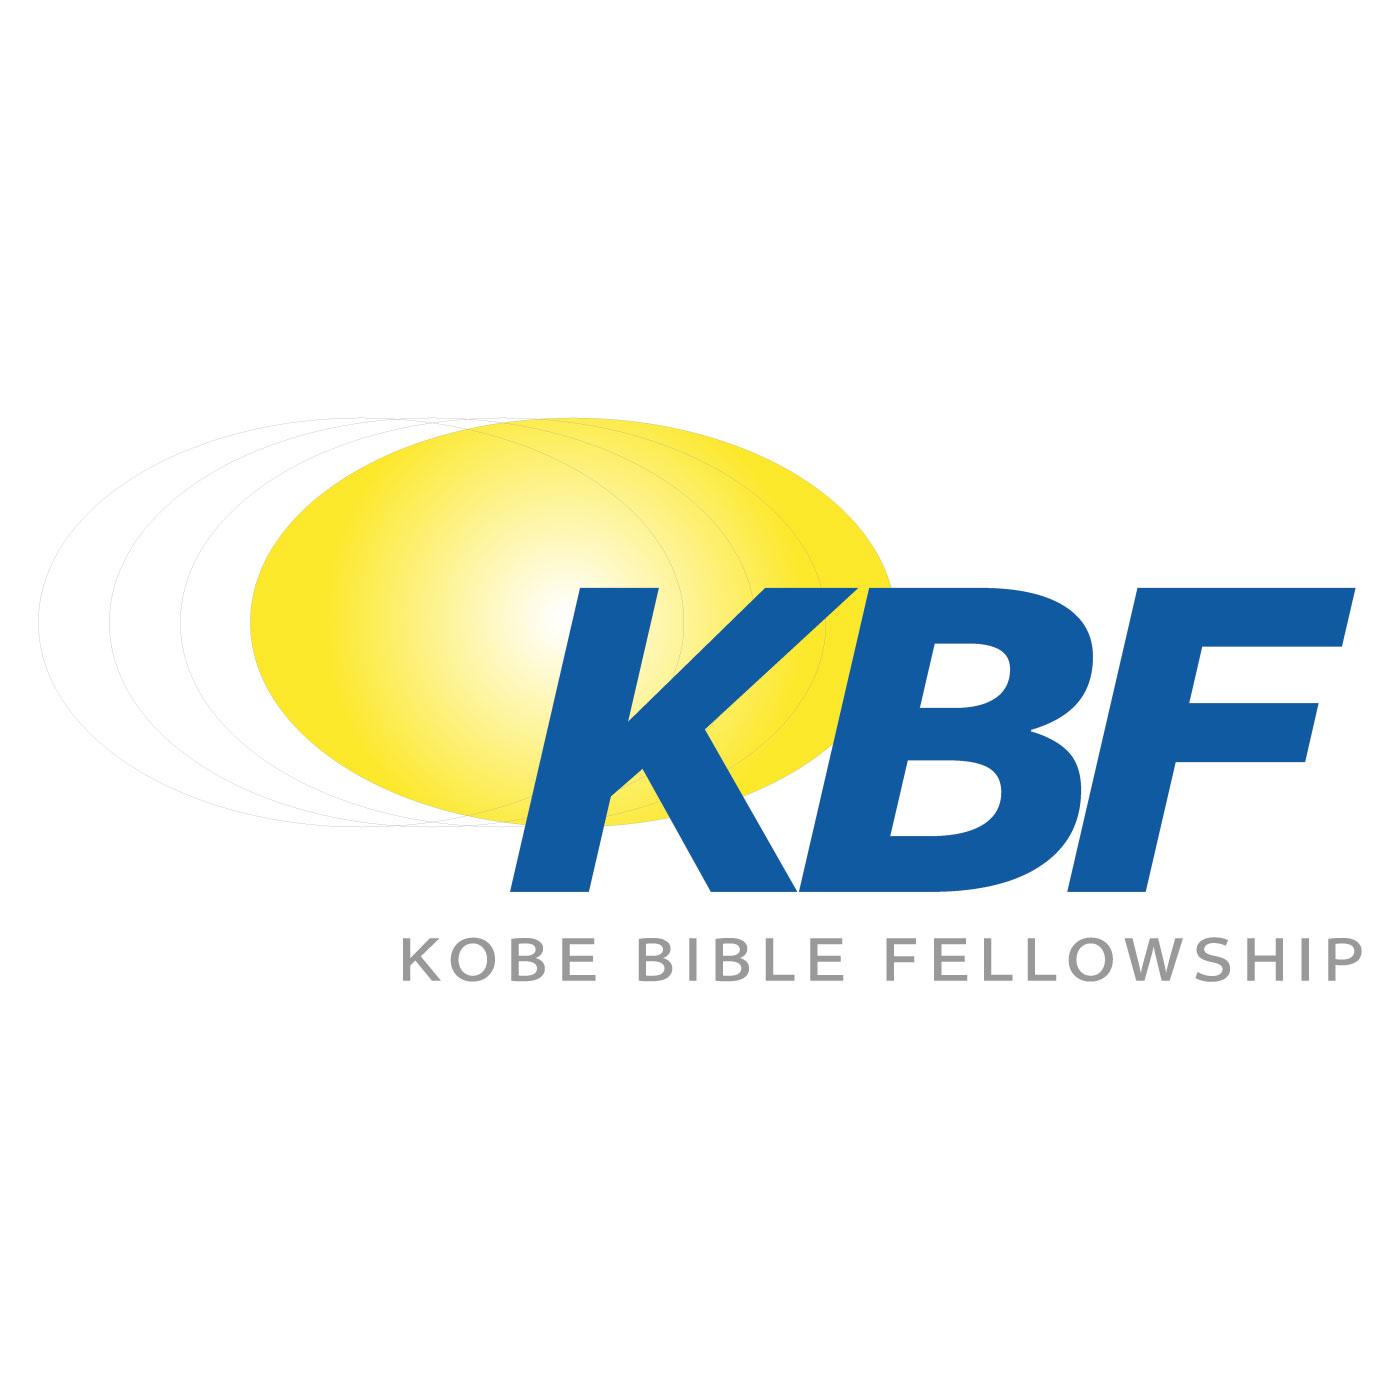 Kobe Bible Fellowship 神戸バイブルフェローシップ